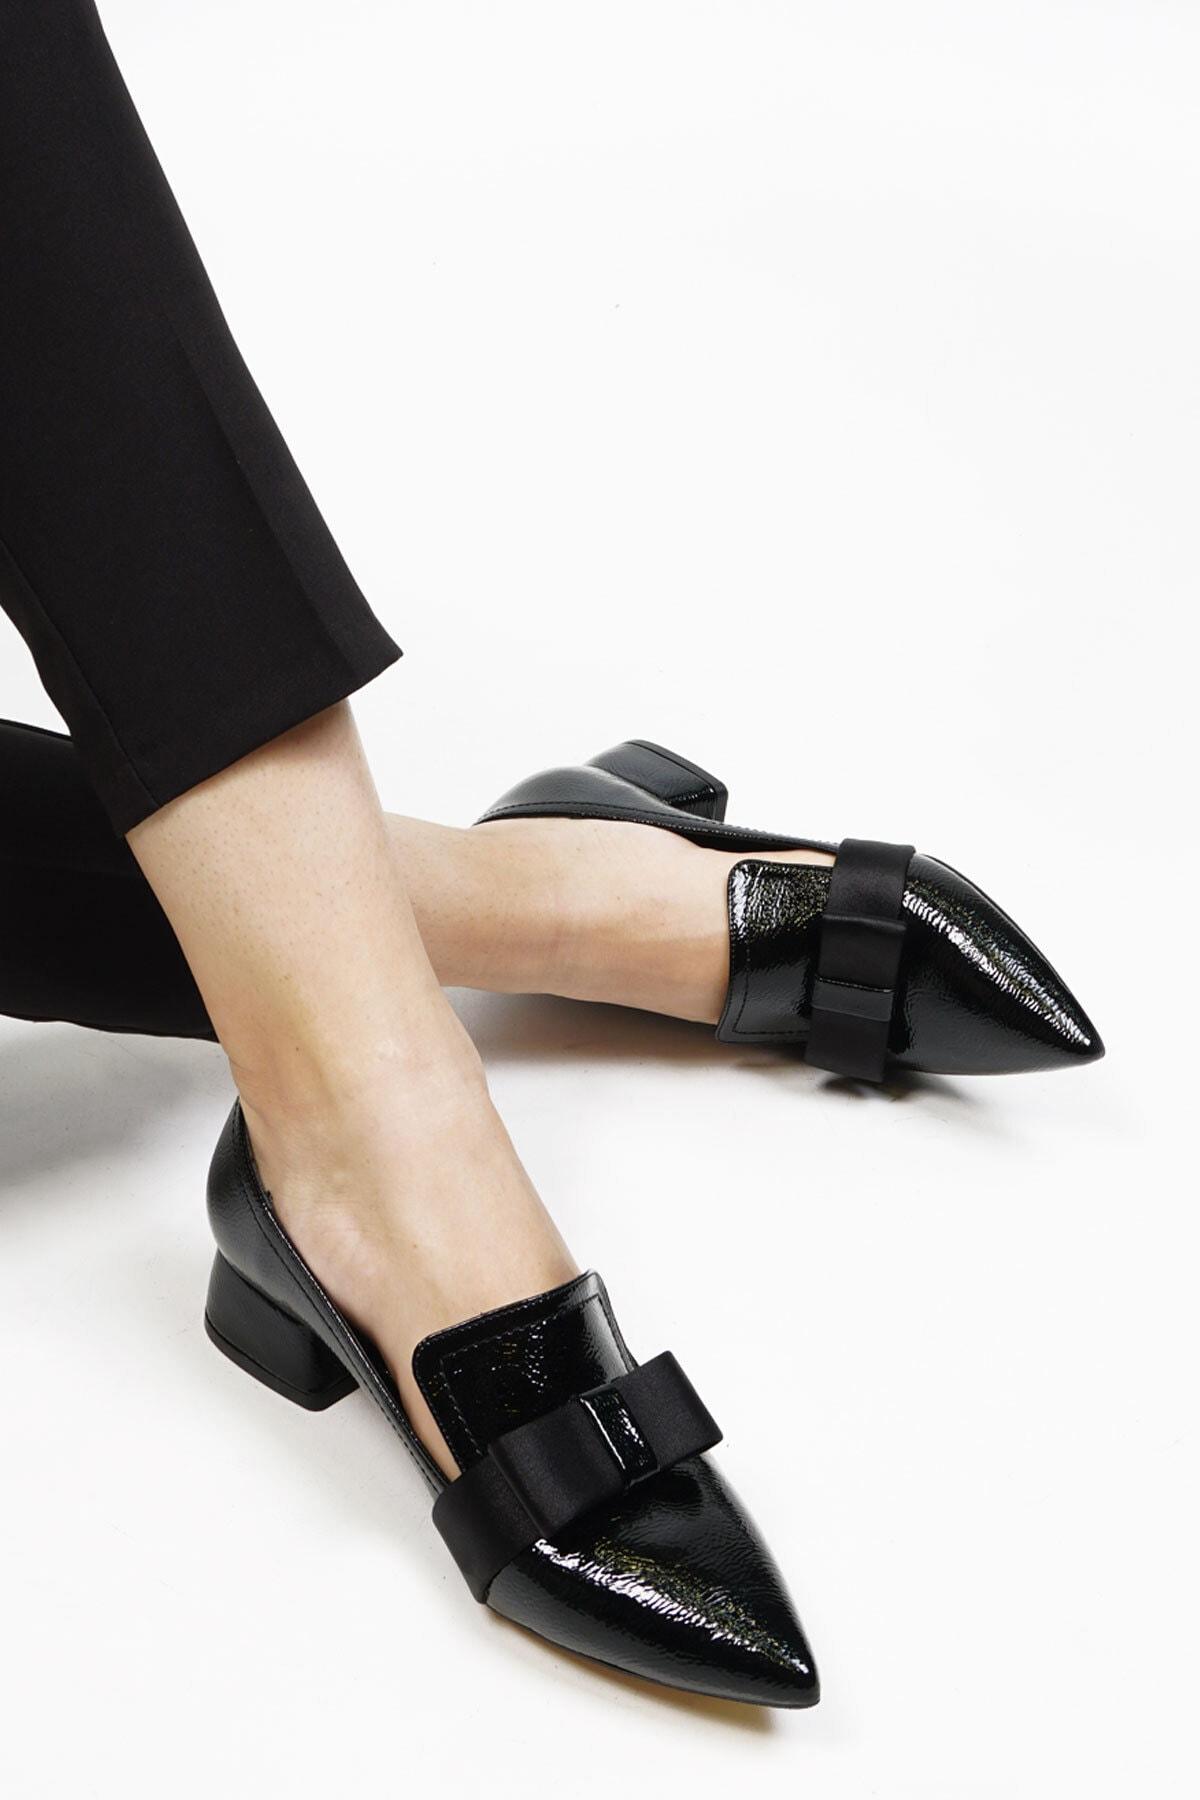 Marjin Siyah Rugan Siyah Rugan Kadın Aros Topuklu Ayakkabı 20Y0016Ls804